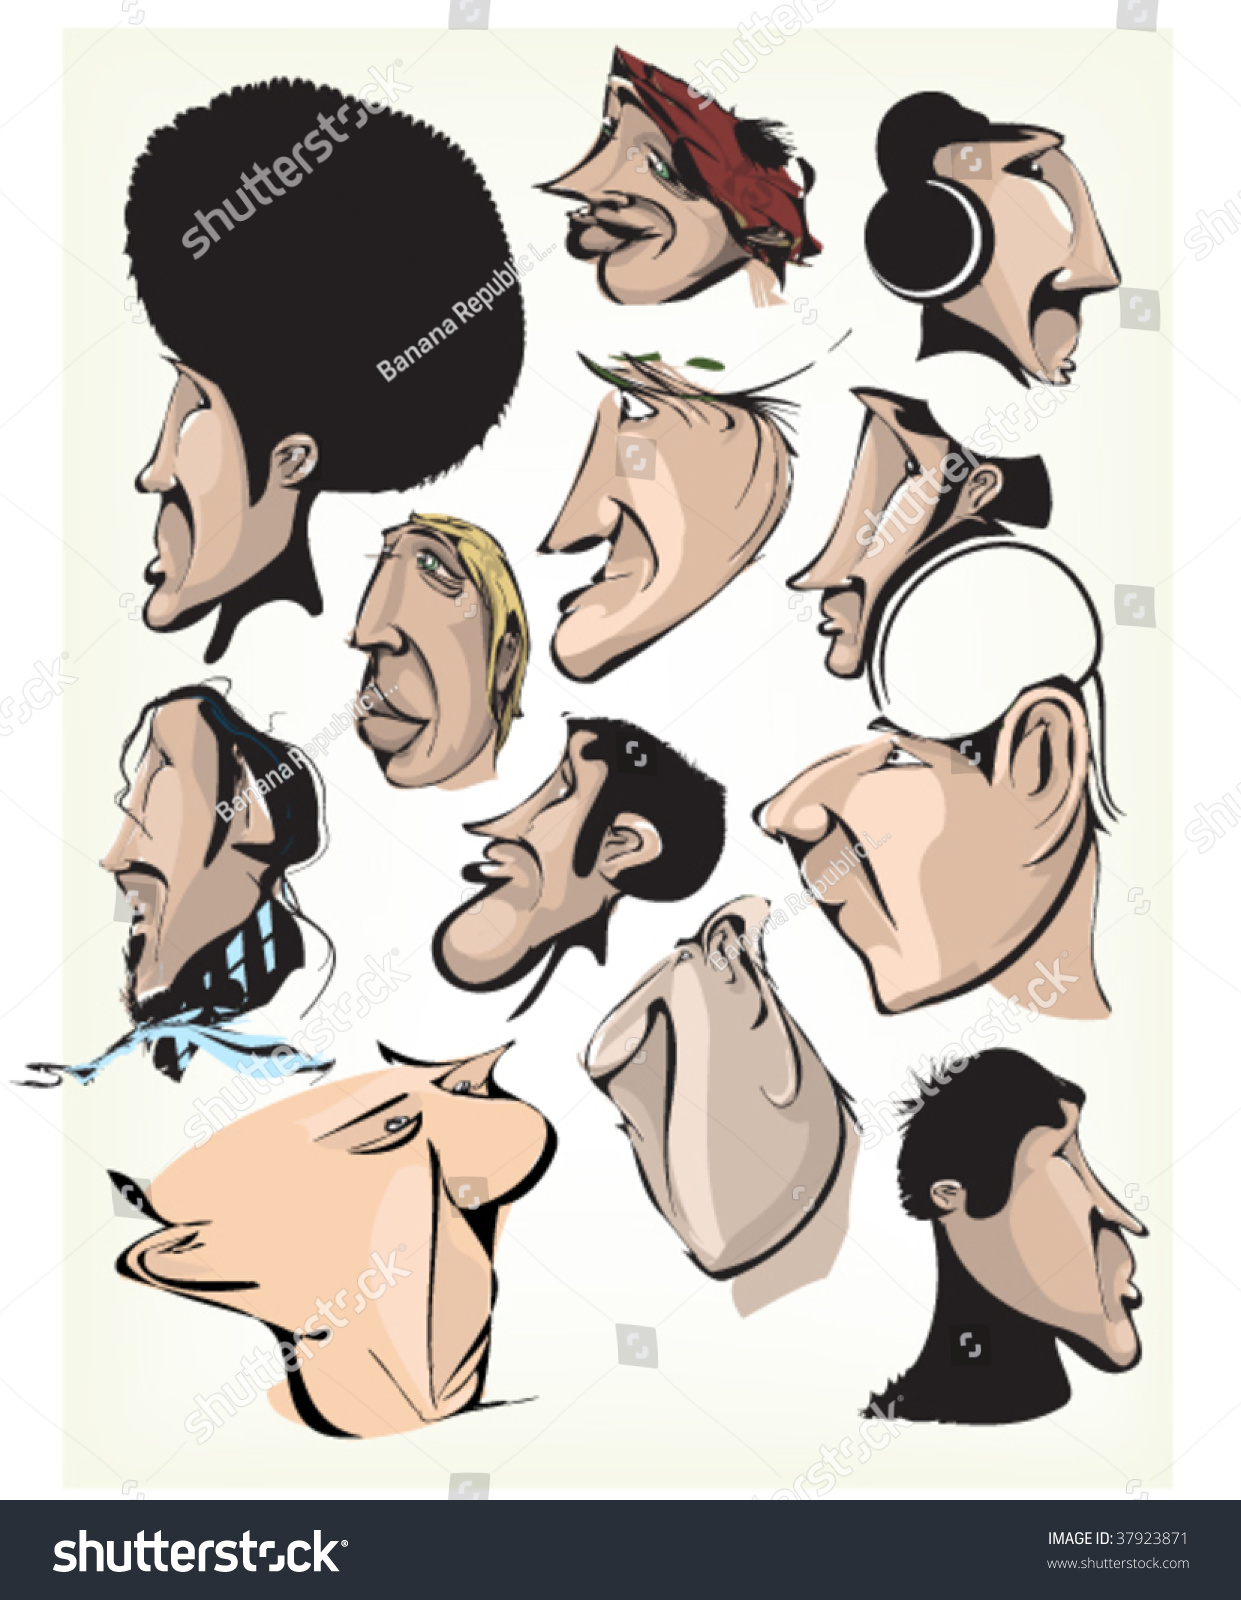 Comic Person Faces Graffiti Characters